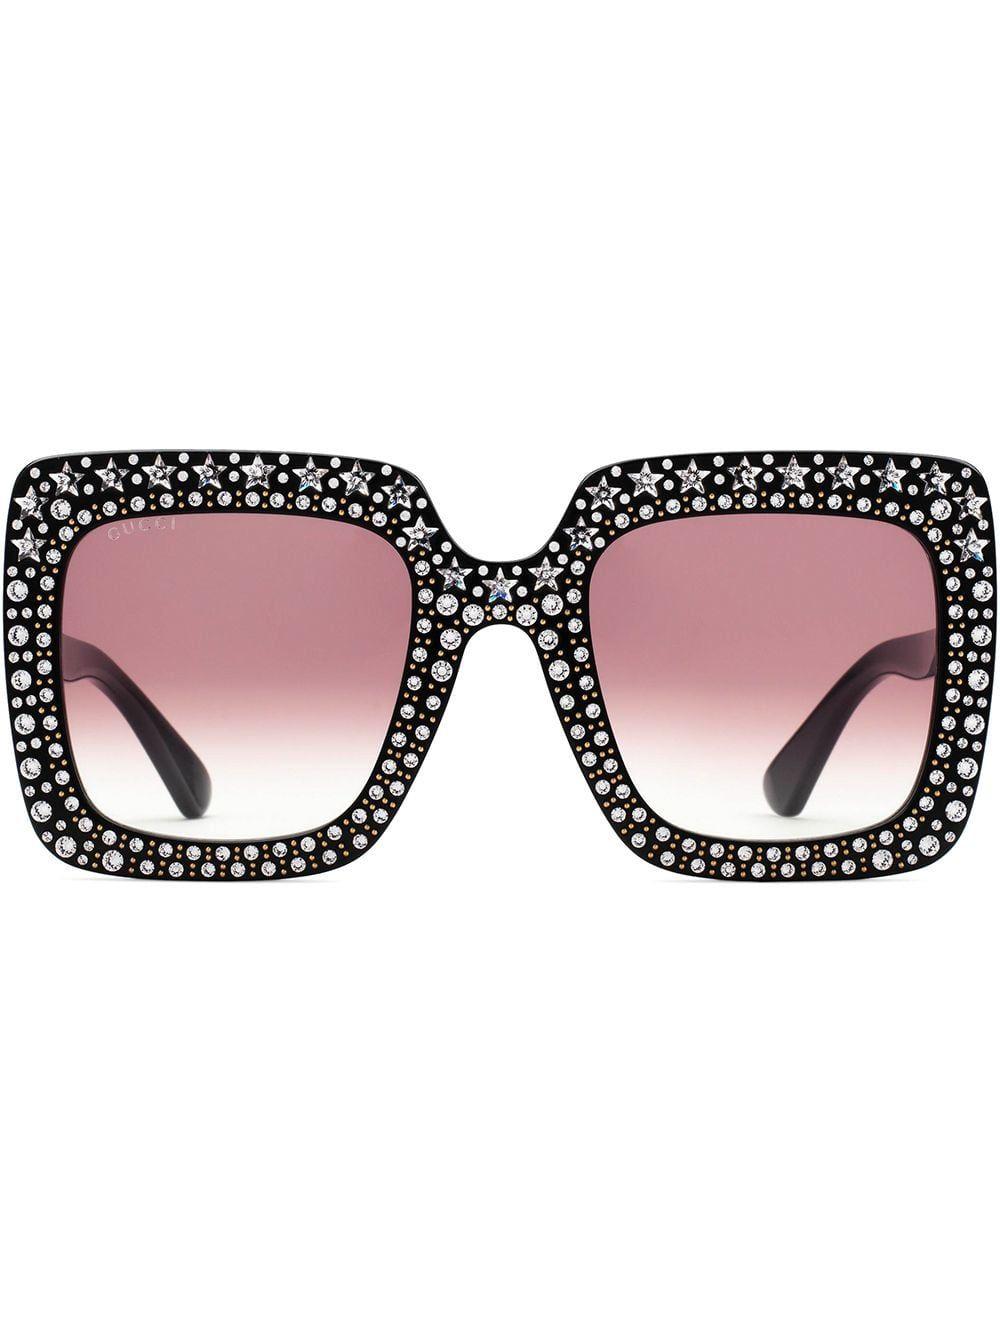 black bejeweled sunglasses